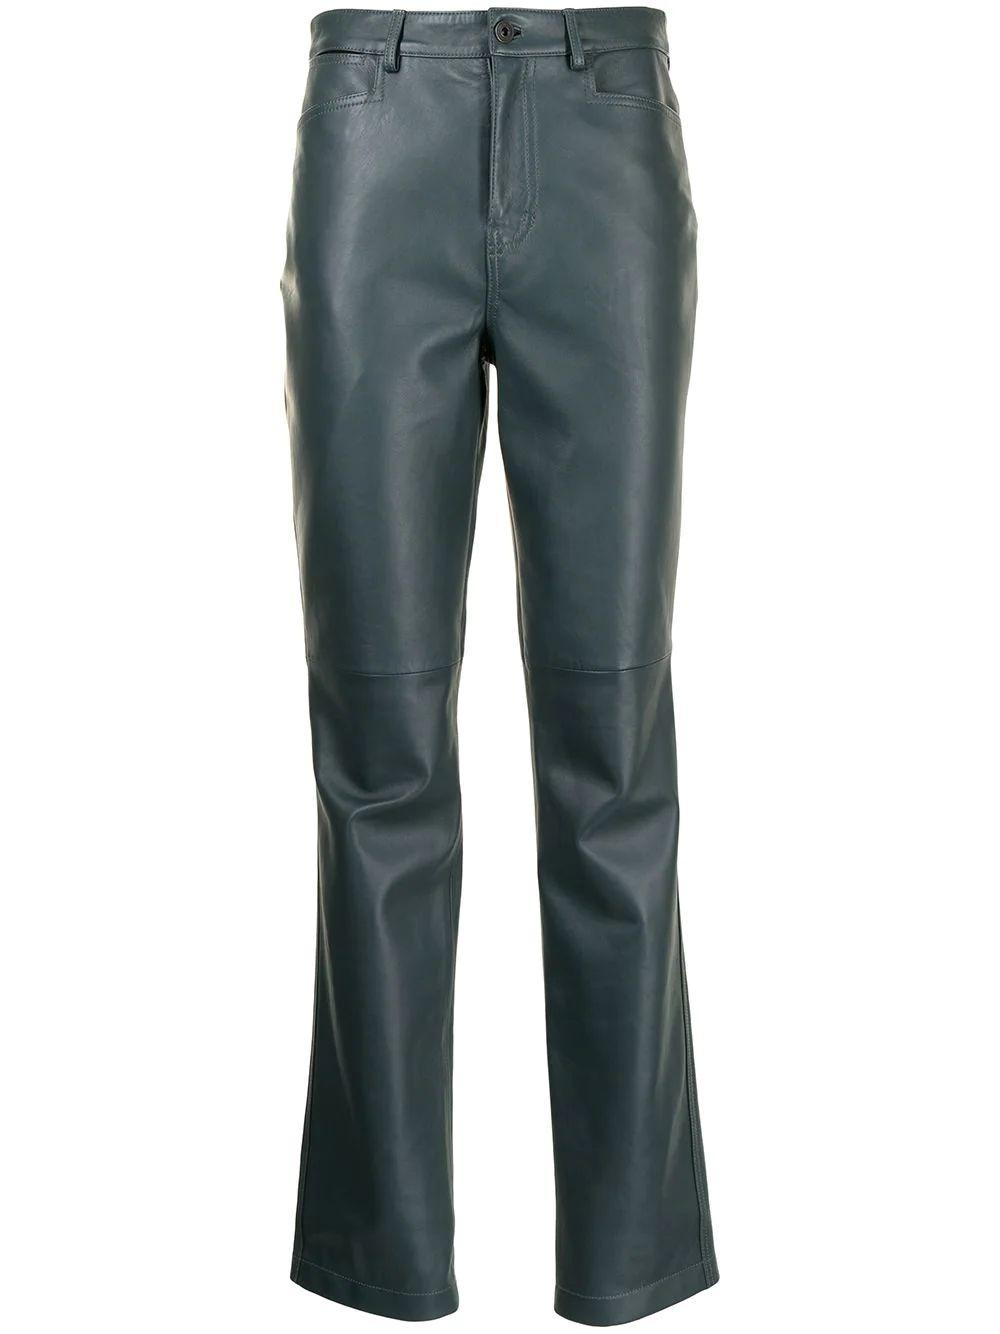 Straight Leather Pant Item # WL2136100